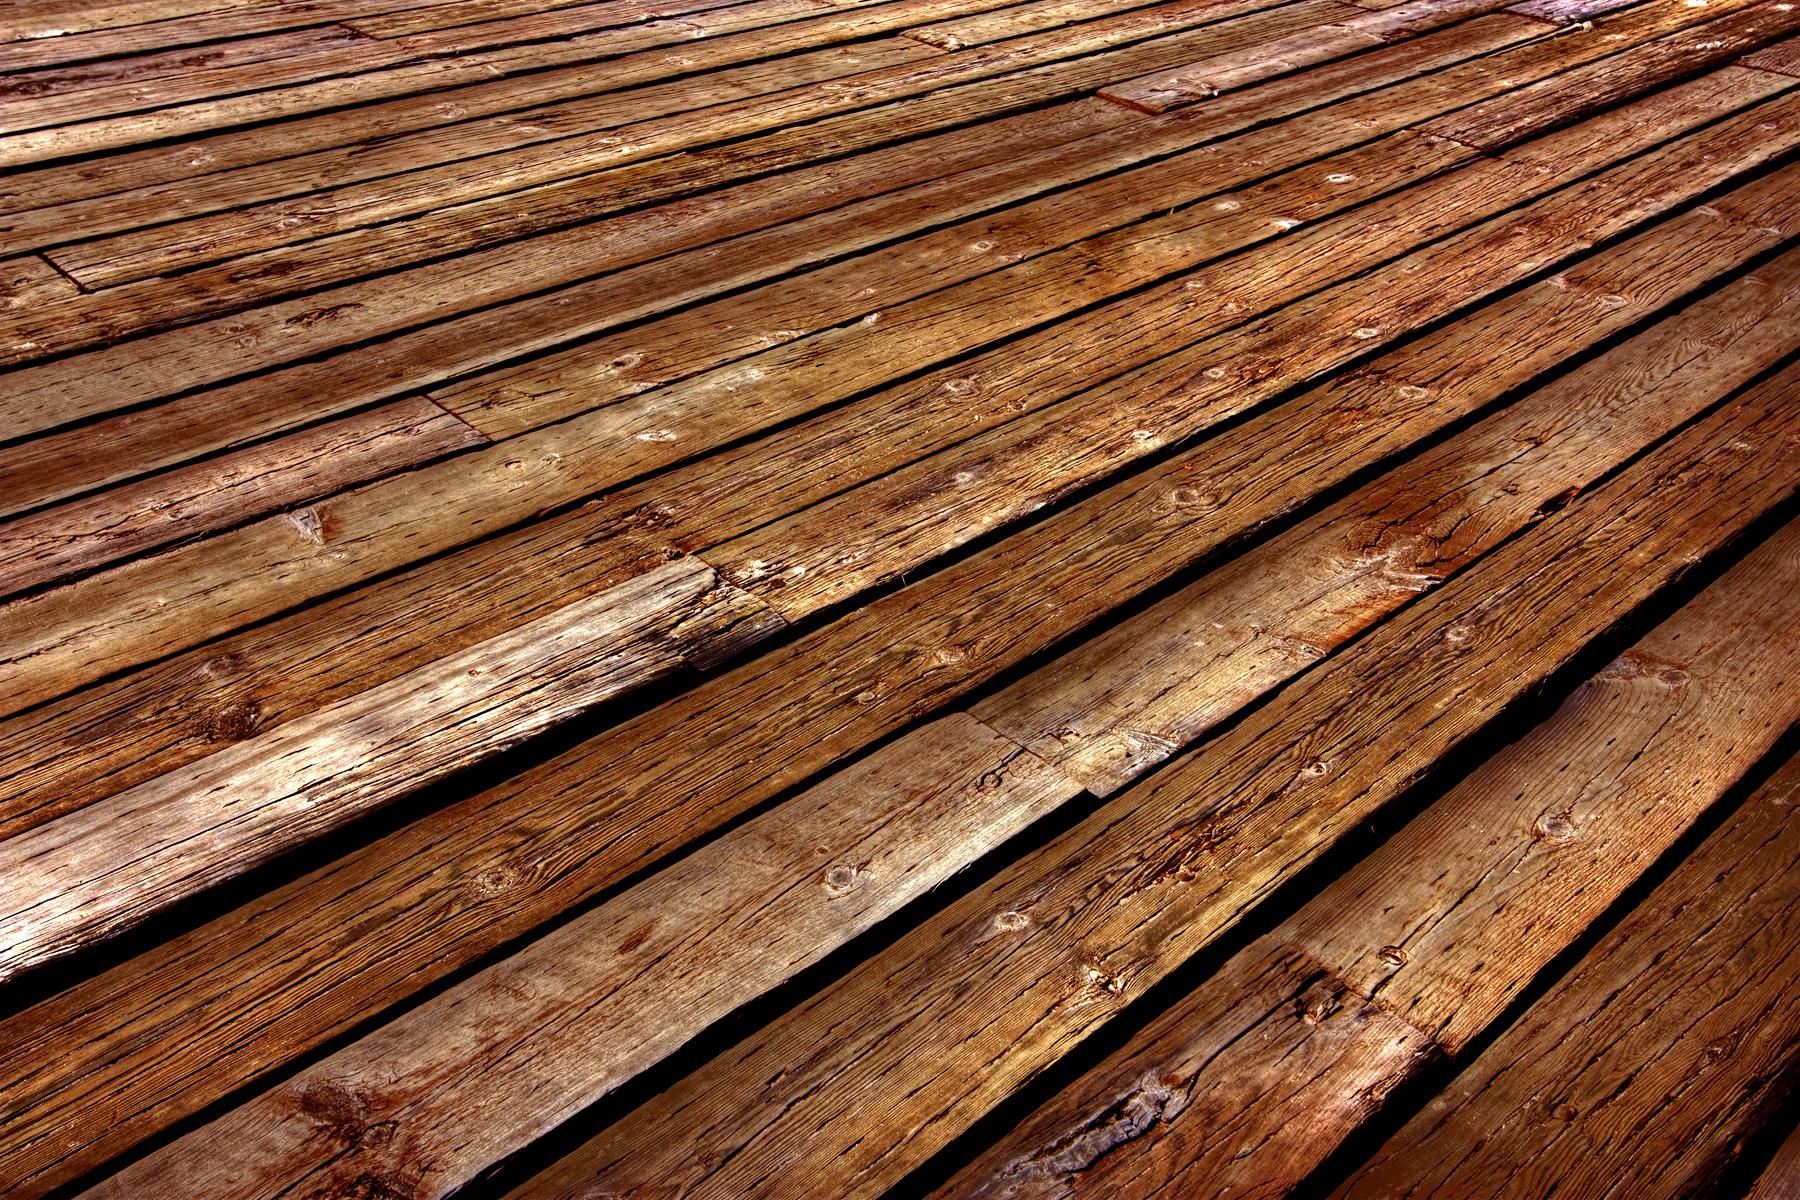 Boardwalk Texture - HDR, Backdrop, Somadjinn, Panelling, Panels, HQ Photo